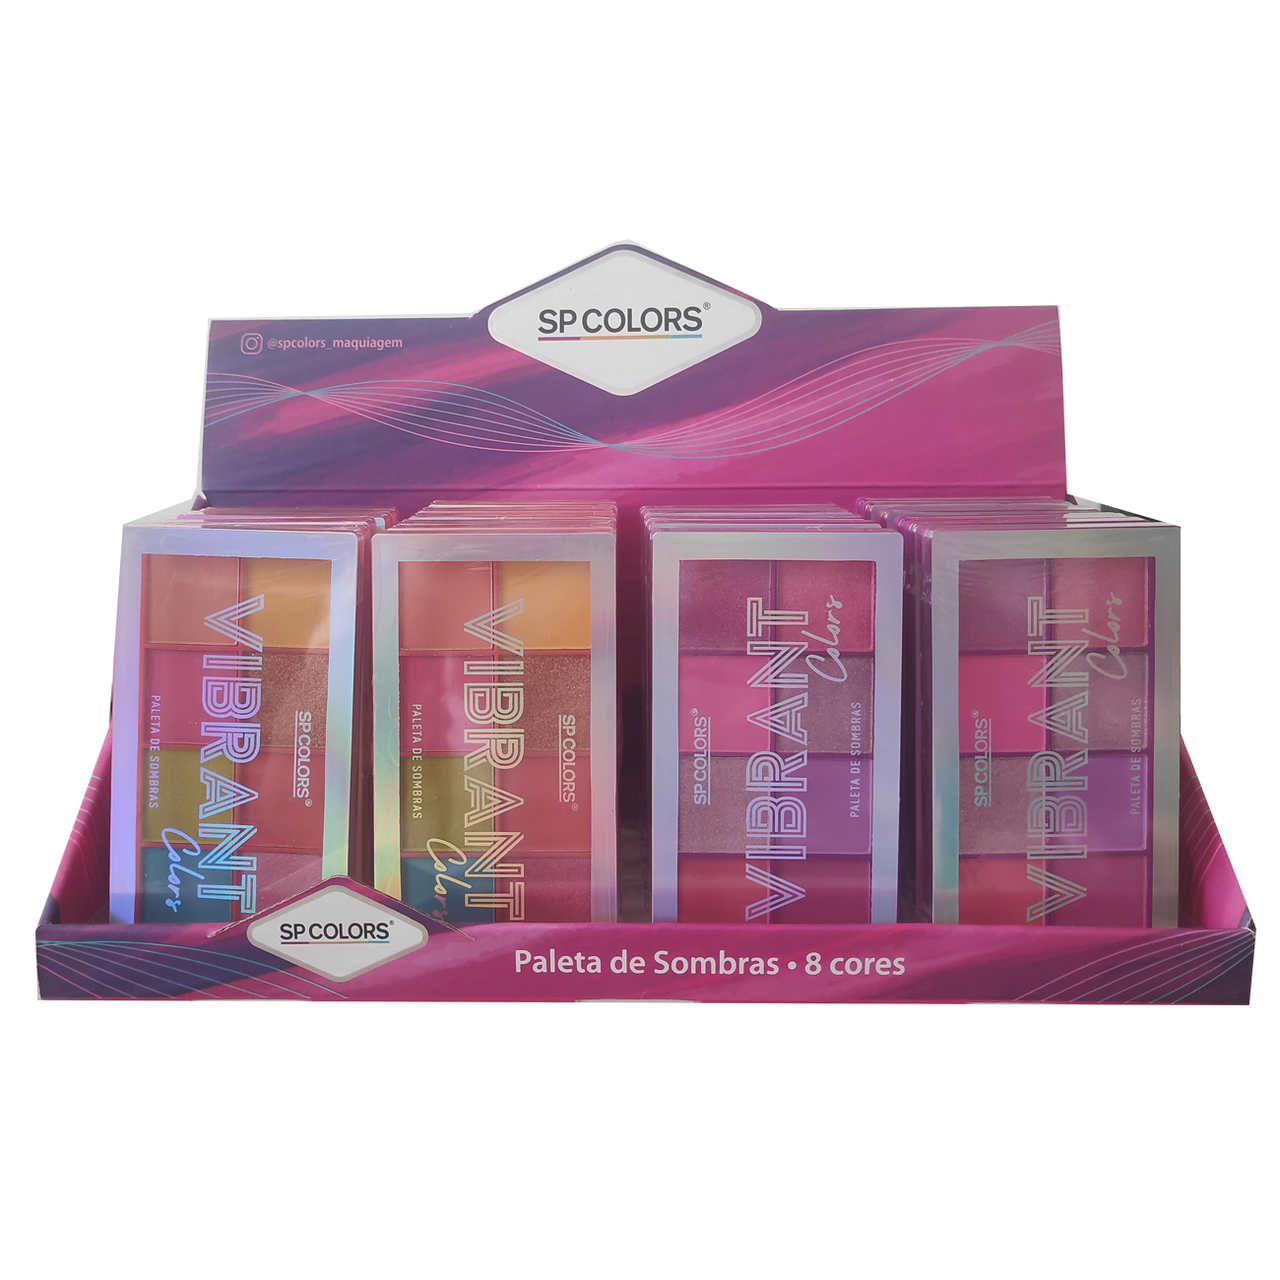 Paleta de Sombras Vibrant Colors SP Colors - Display com 24 unidades - SP172 Atacado